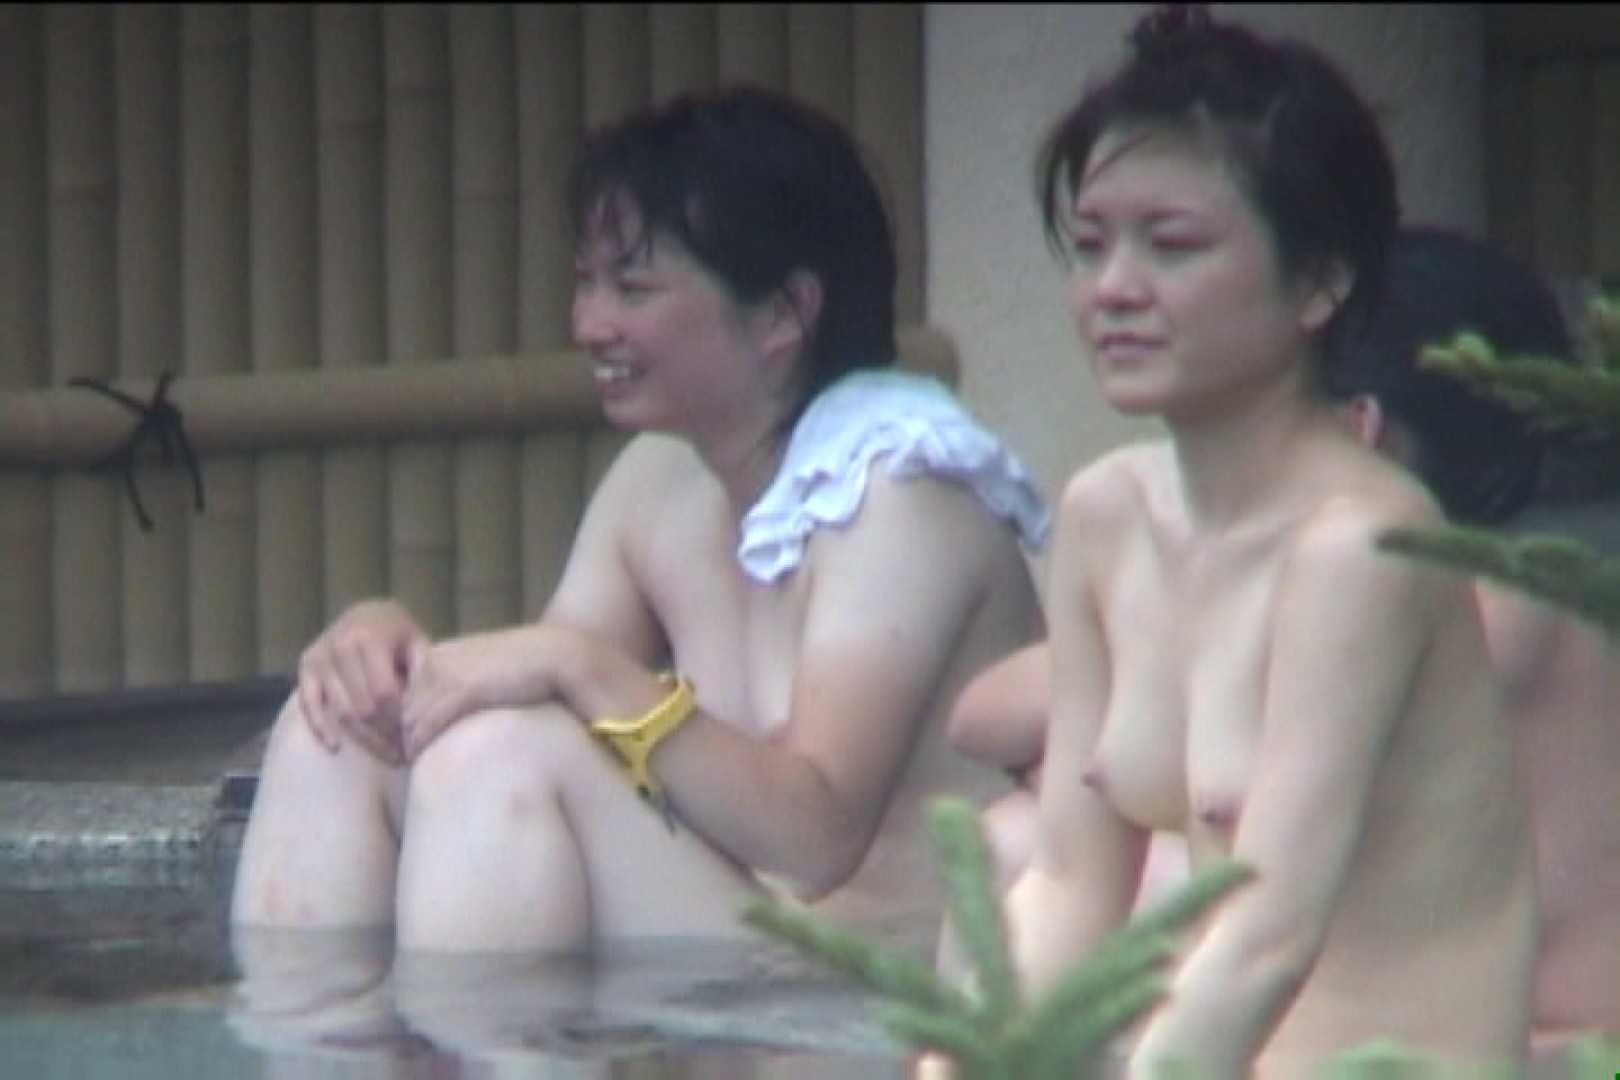 Aquaな露天風呂Vol.94【VIP限定】 OLセックス 盗撮エロ画像 79画像 5